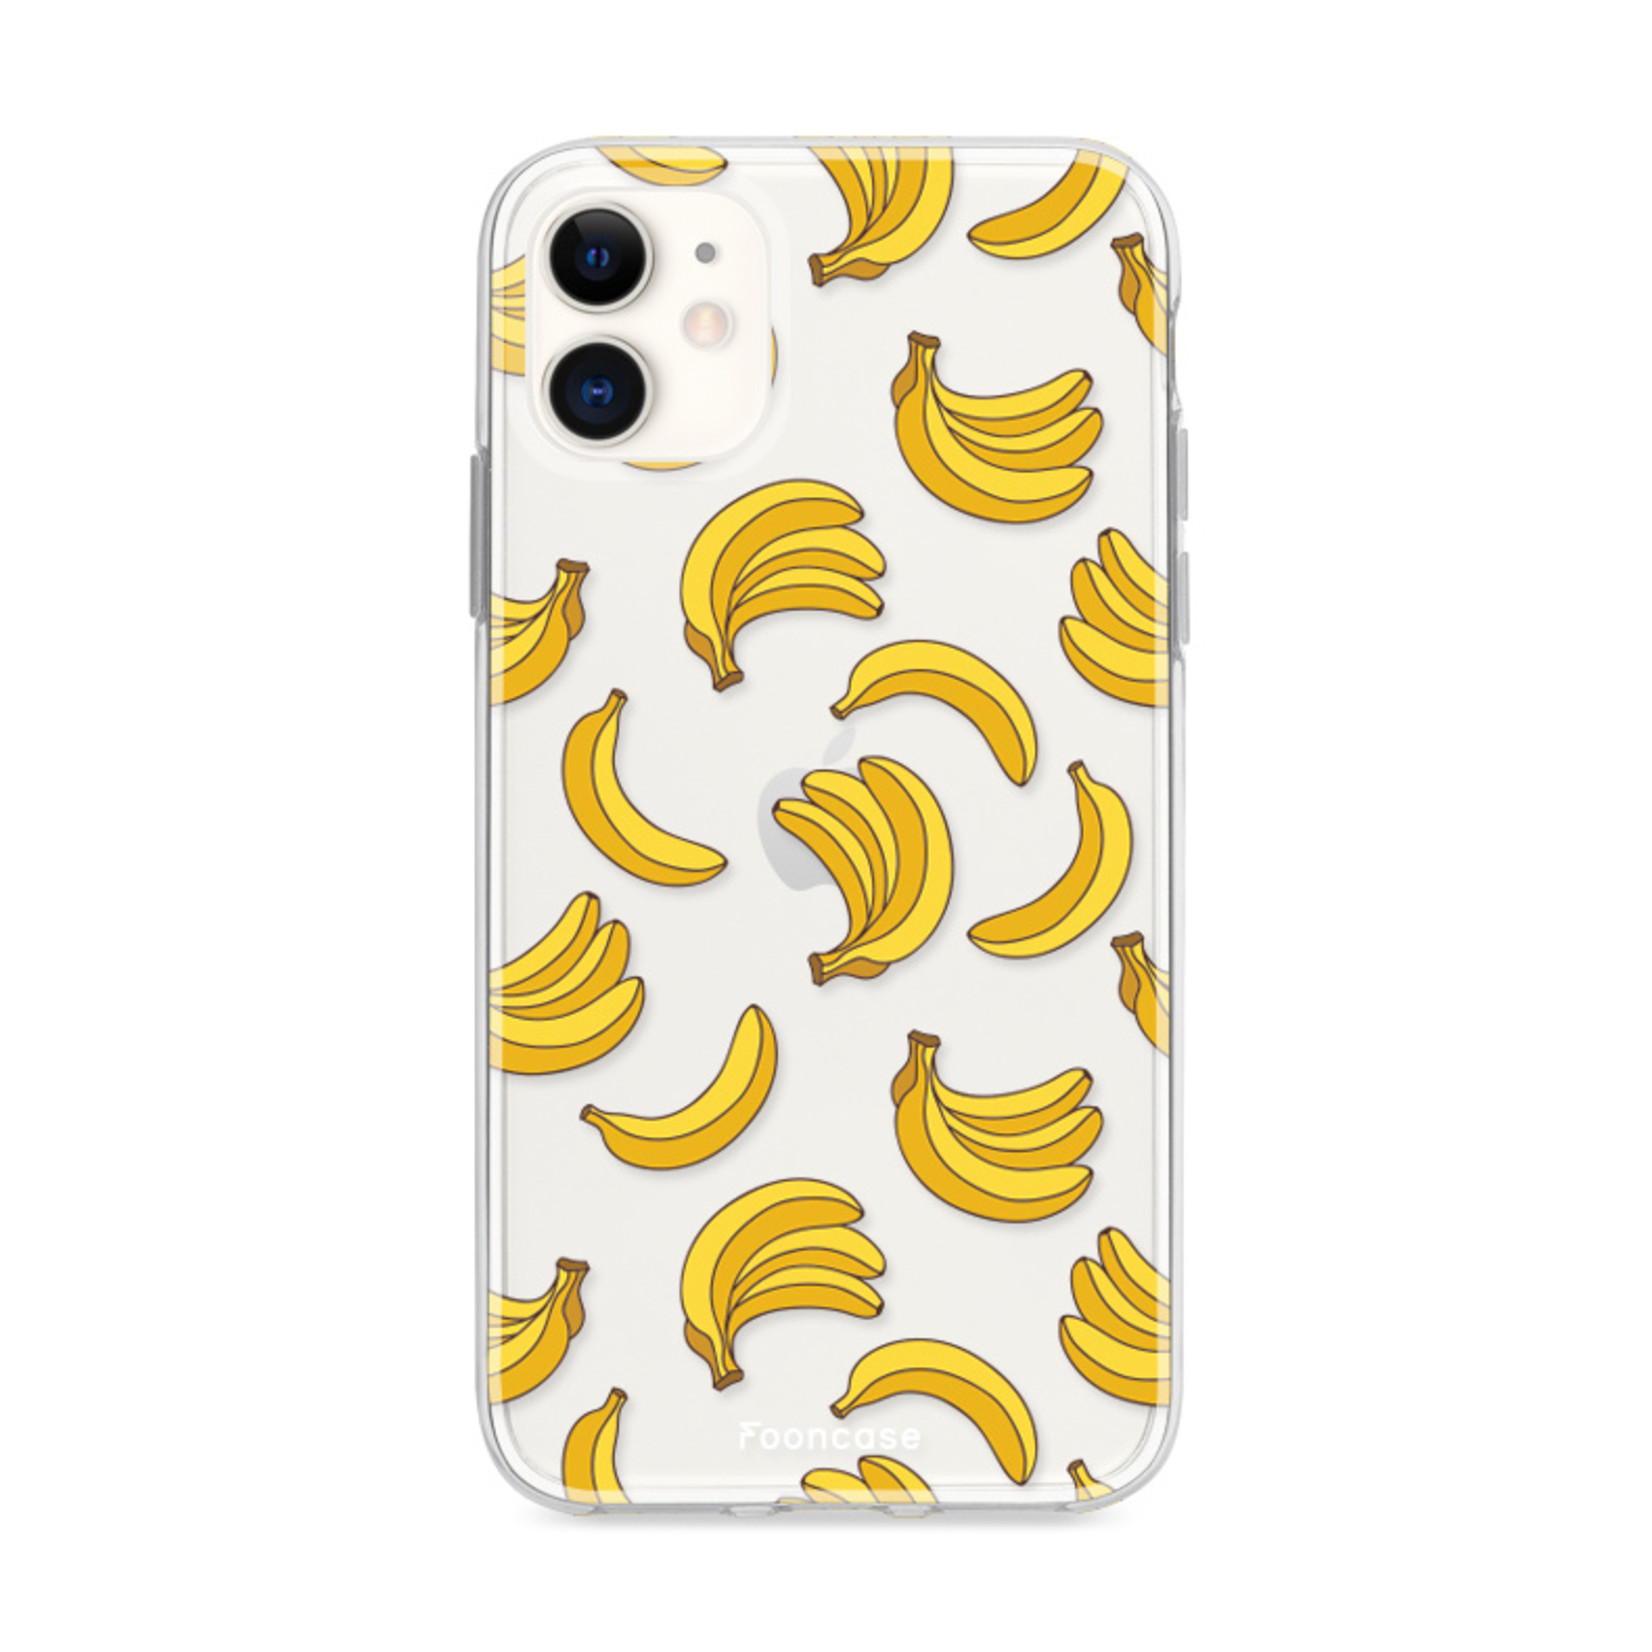 FOONCASE Iphone 12 Handyhülle - Bananas